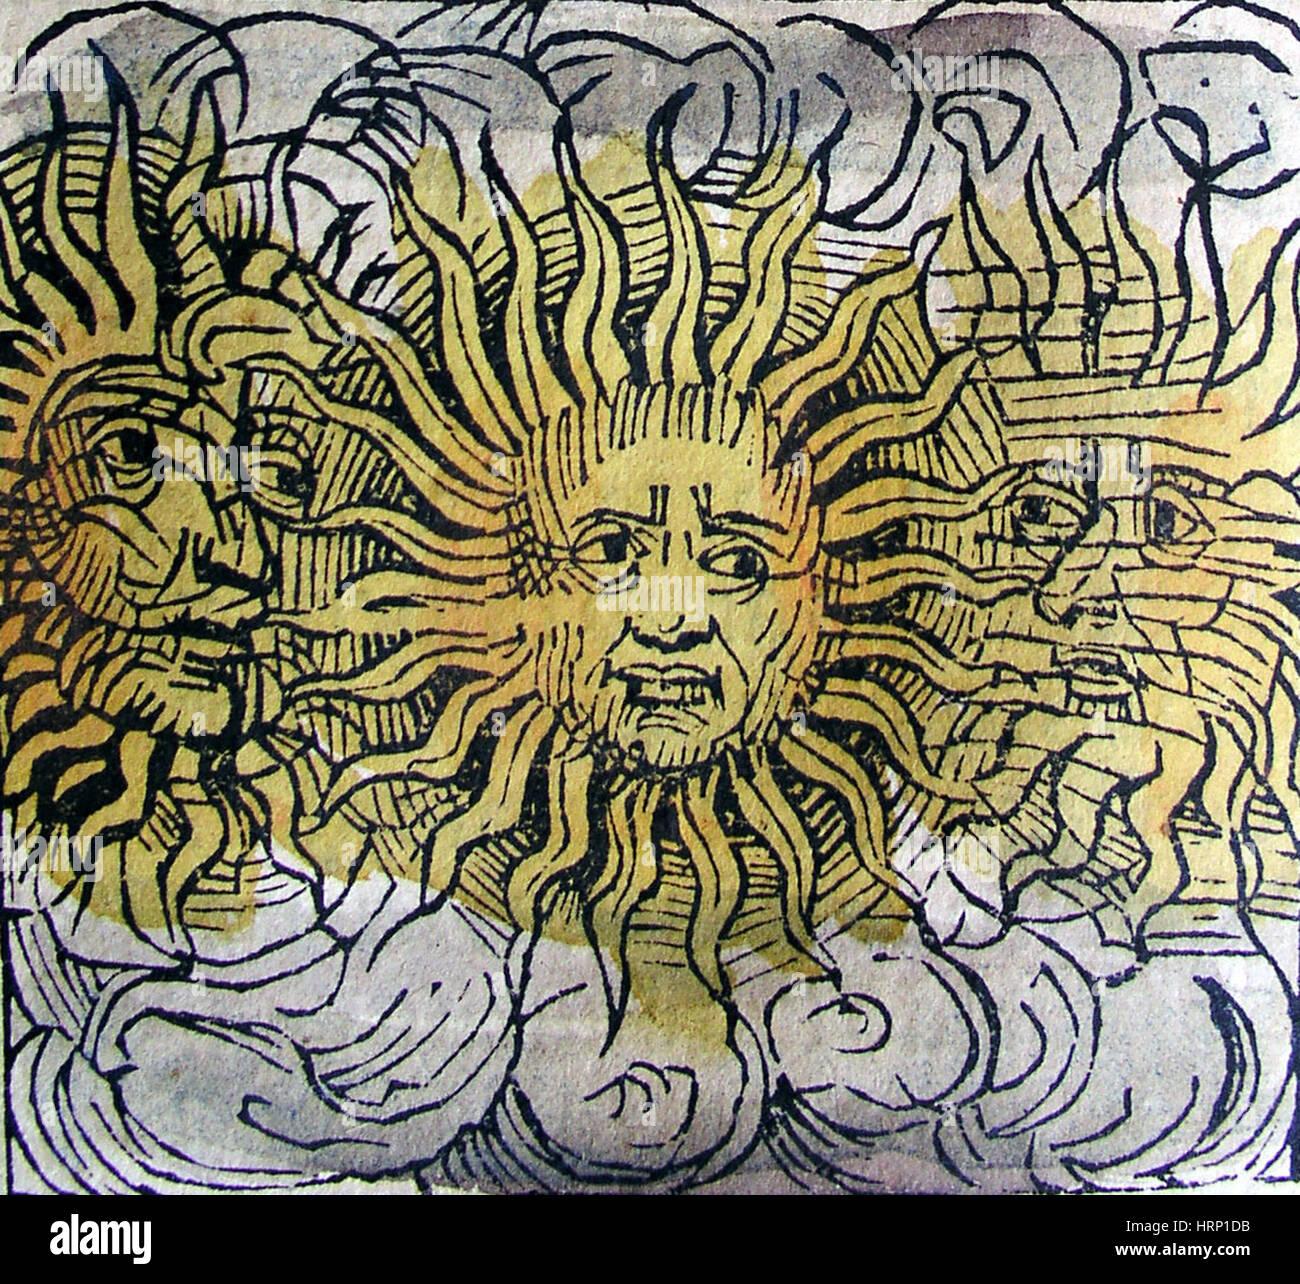 Three Suns, Nuremberg Chronicles, 1493 - Stock Image